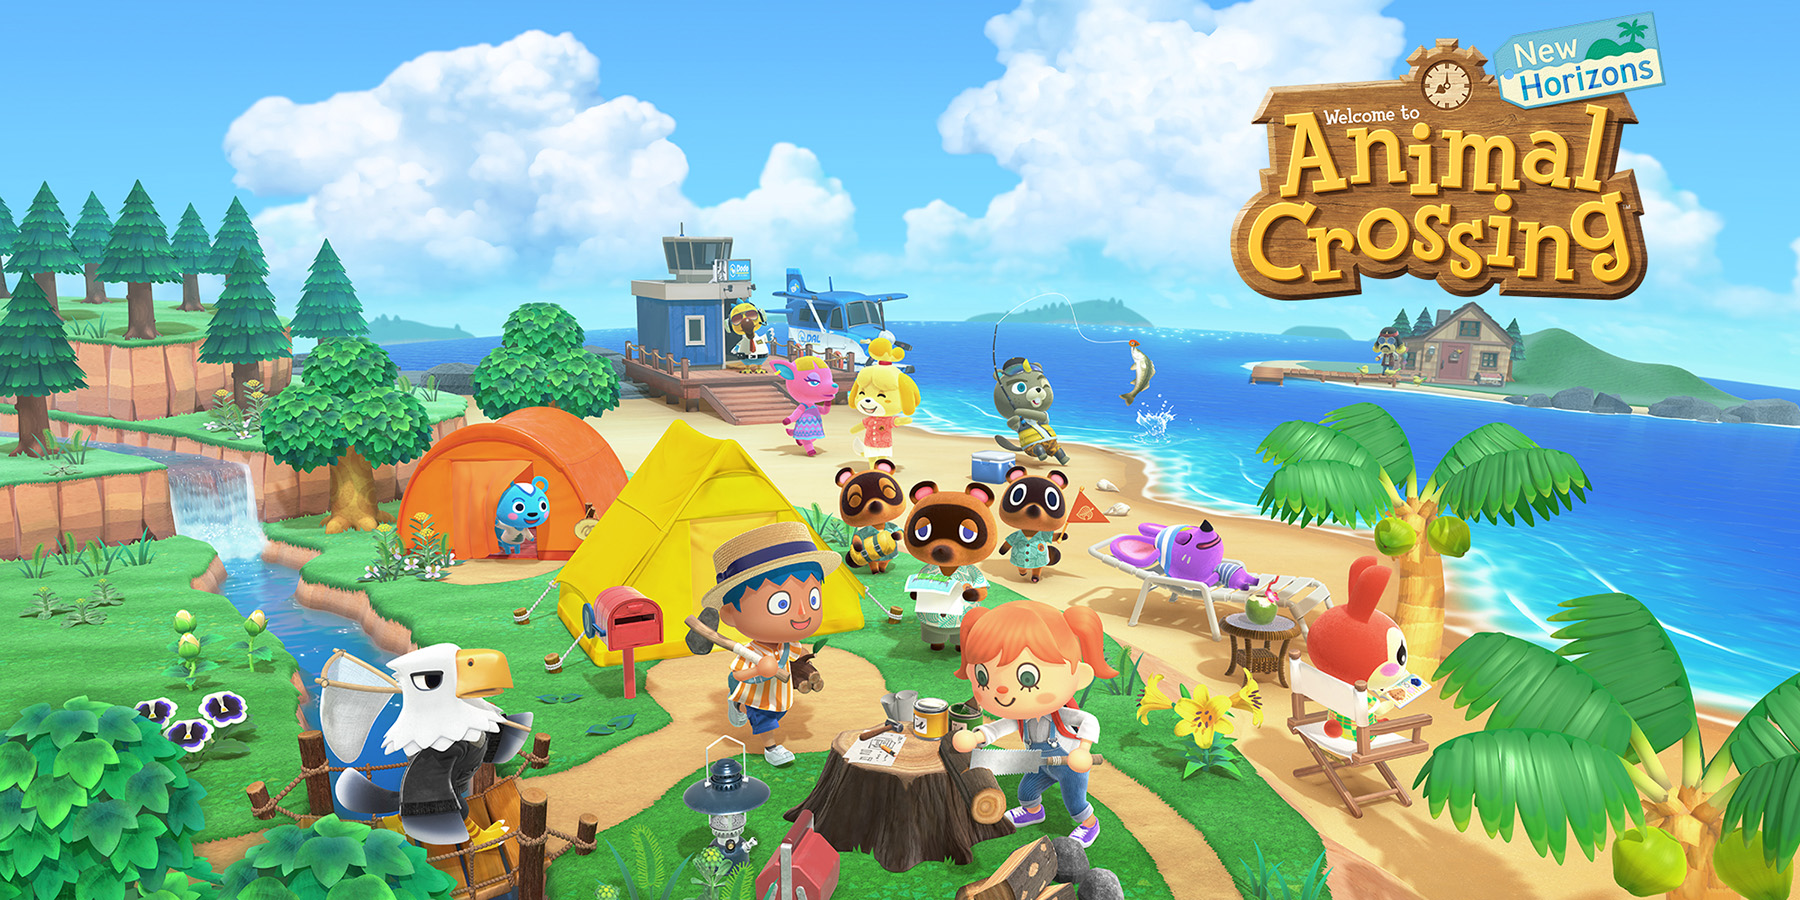 Animal Crossing, New Horizons